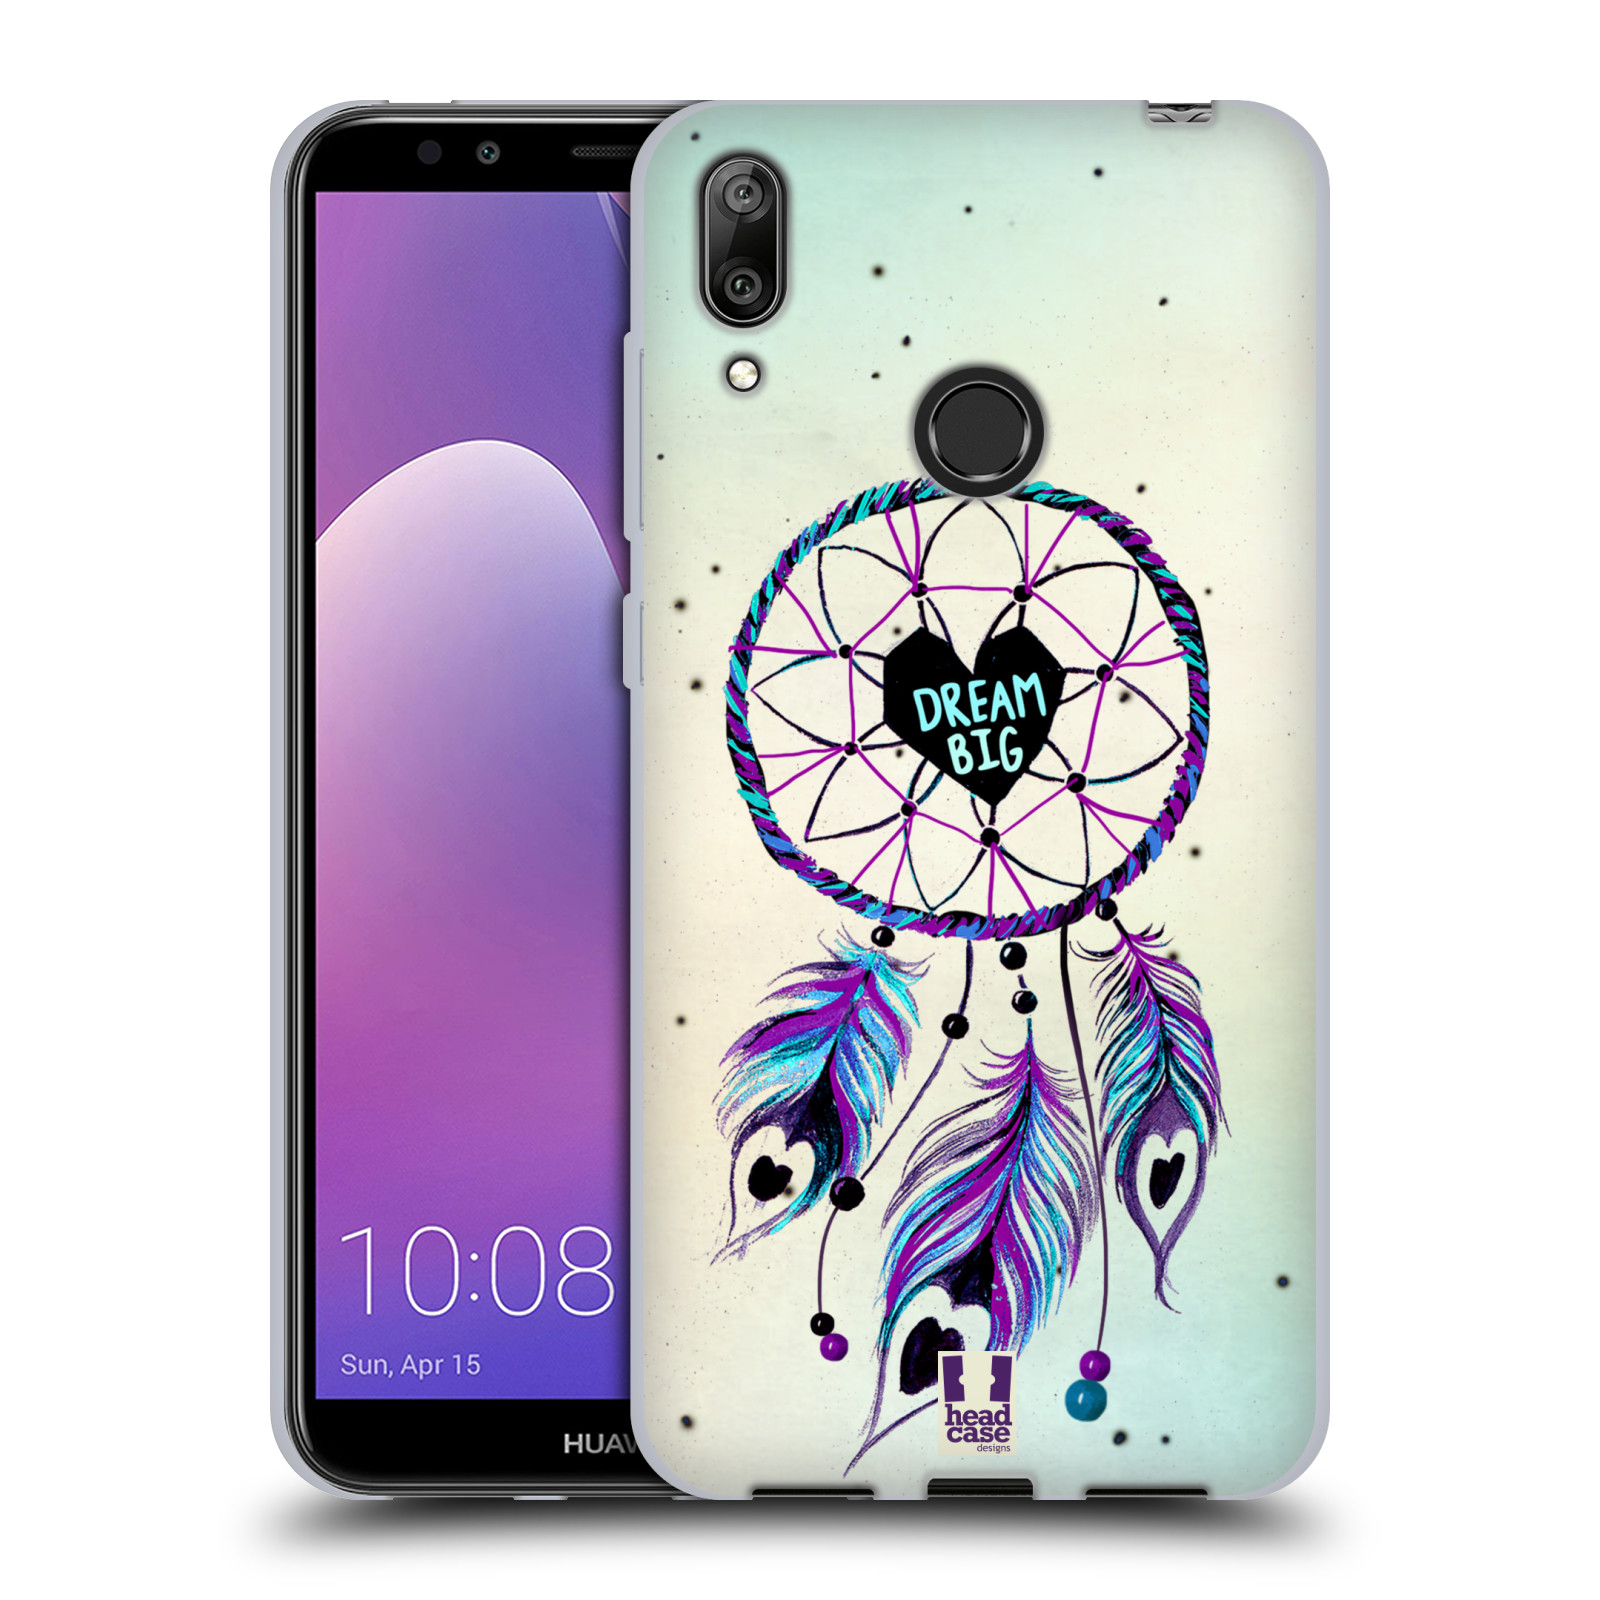 Silikonové pouzdro na mobil Huawei Y7 (2019) - Head Case - Lapač Assorted Dream Big Srdce